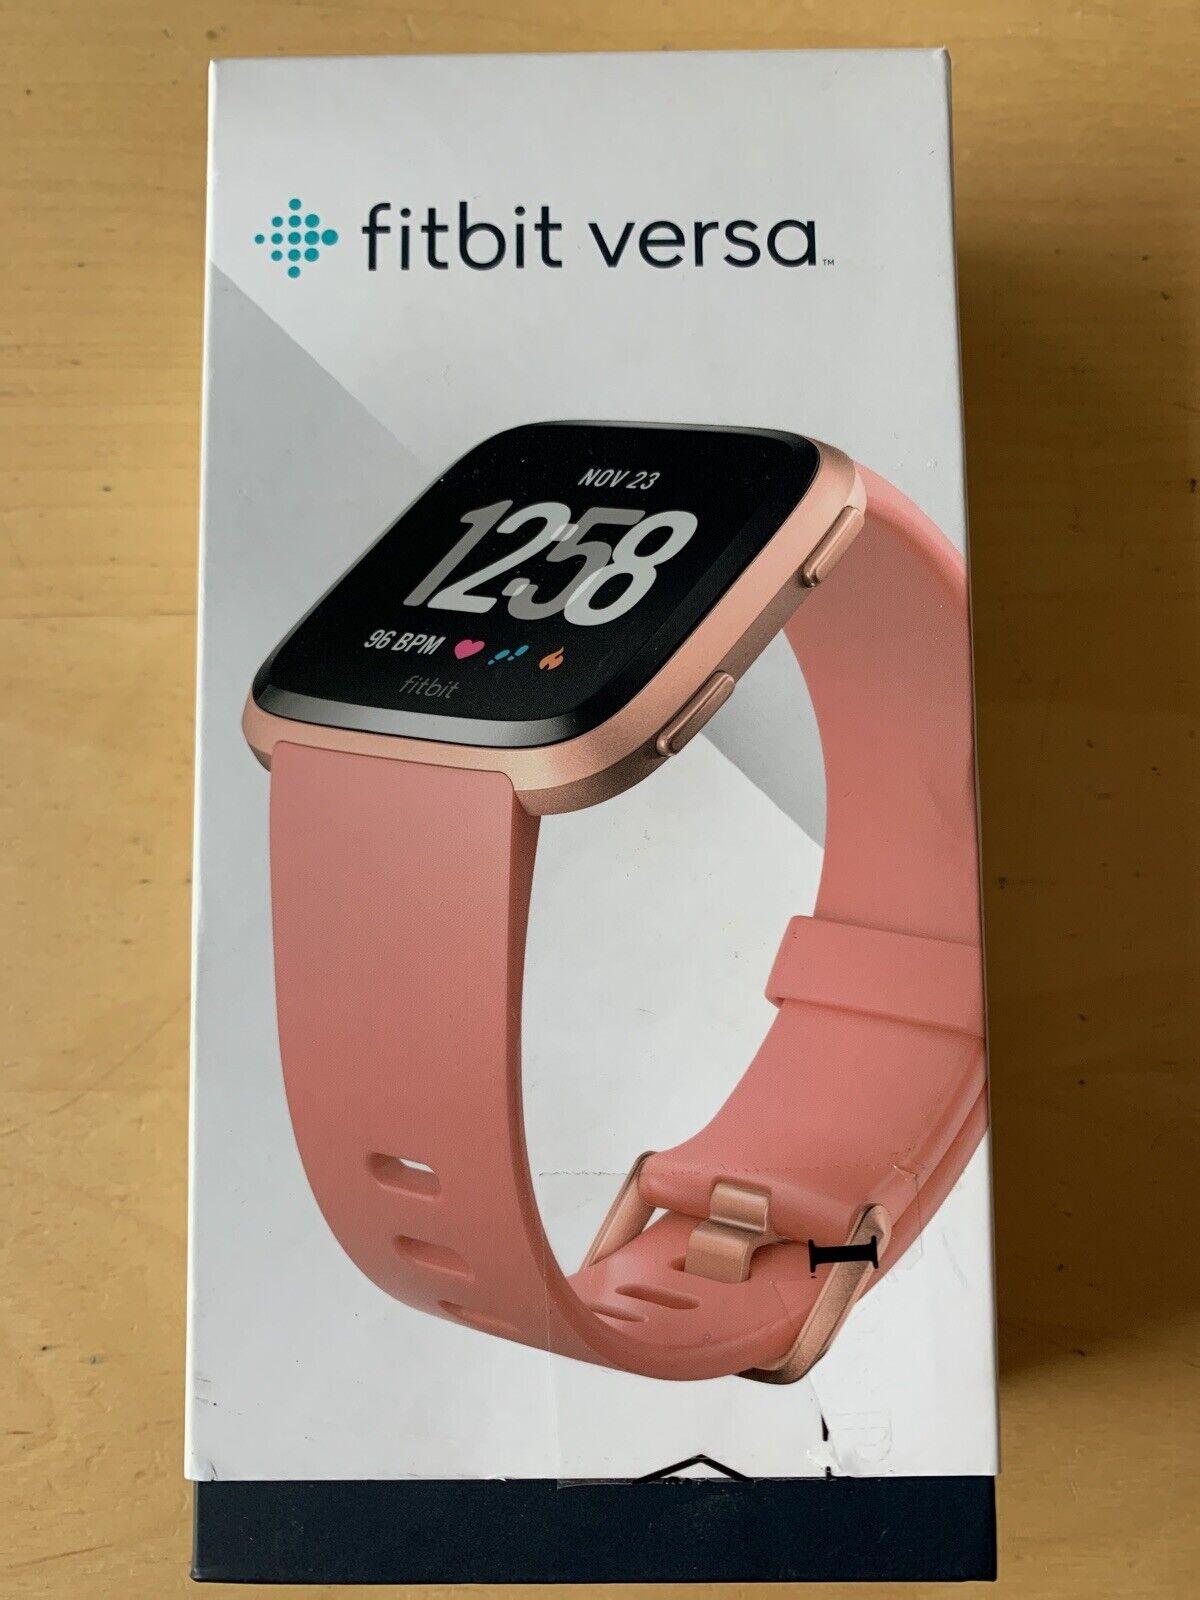 FITBIT VERSA SmartWatch Activity Fitness Tracker - Peach/Rose Gold BUNDLE FB504 activity bundle fb504 Featured fitbit fitness gold smartwatch tracker versa